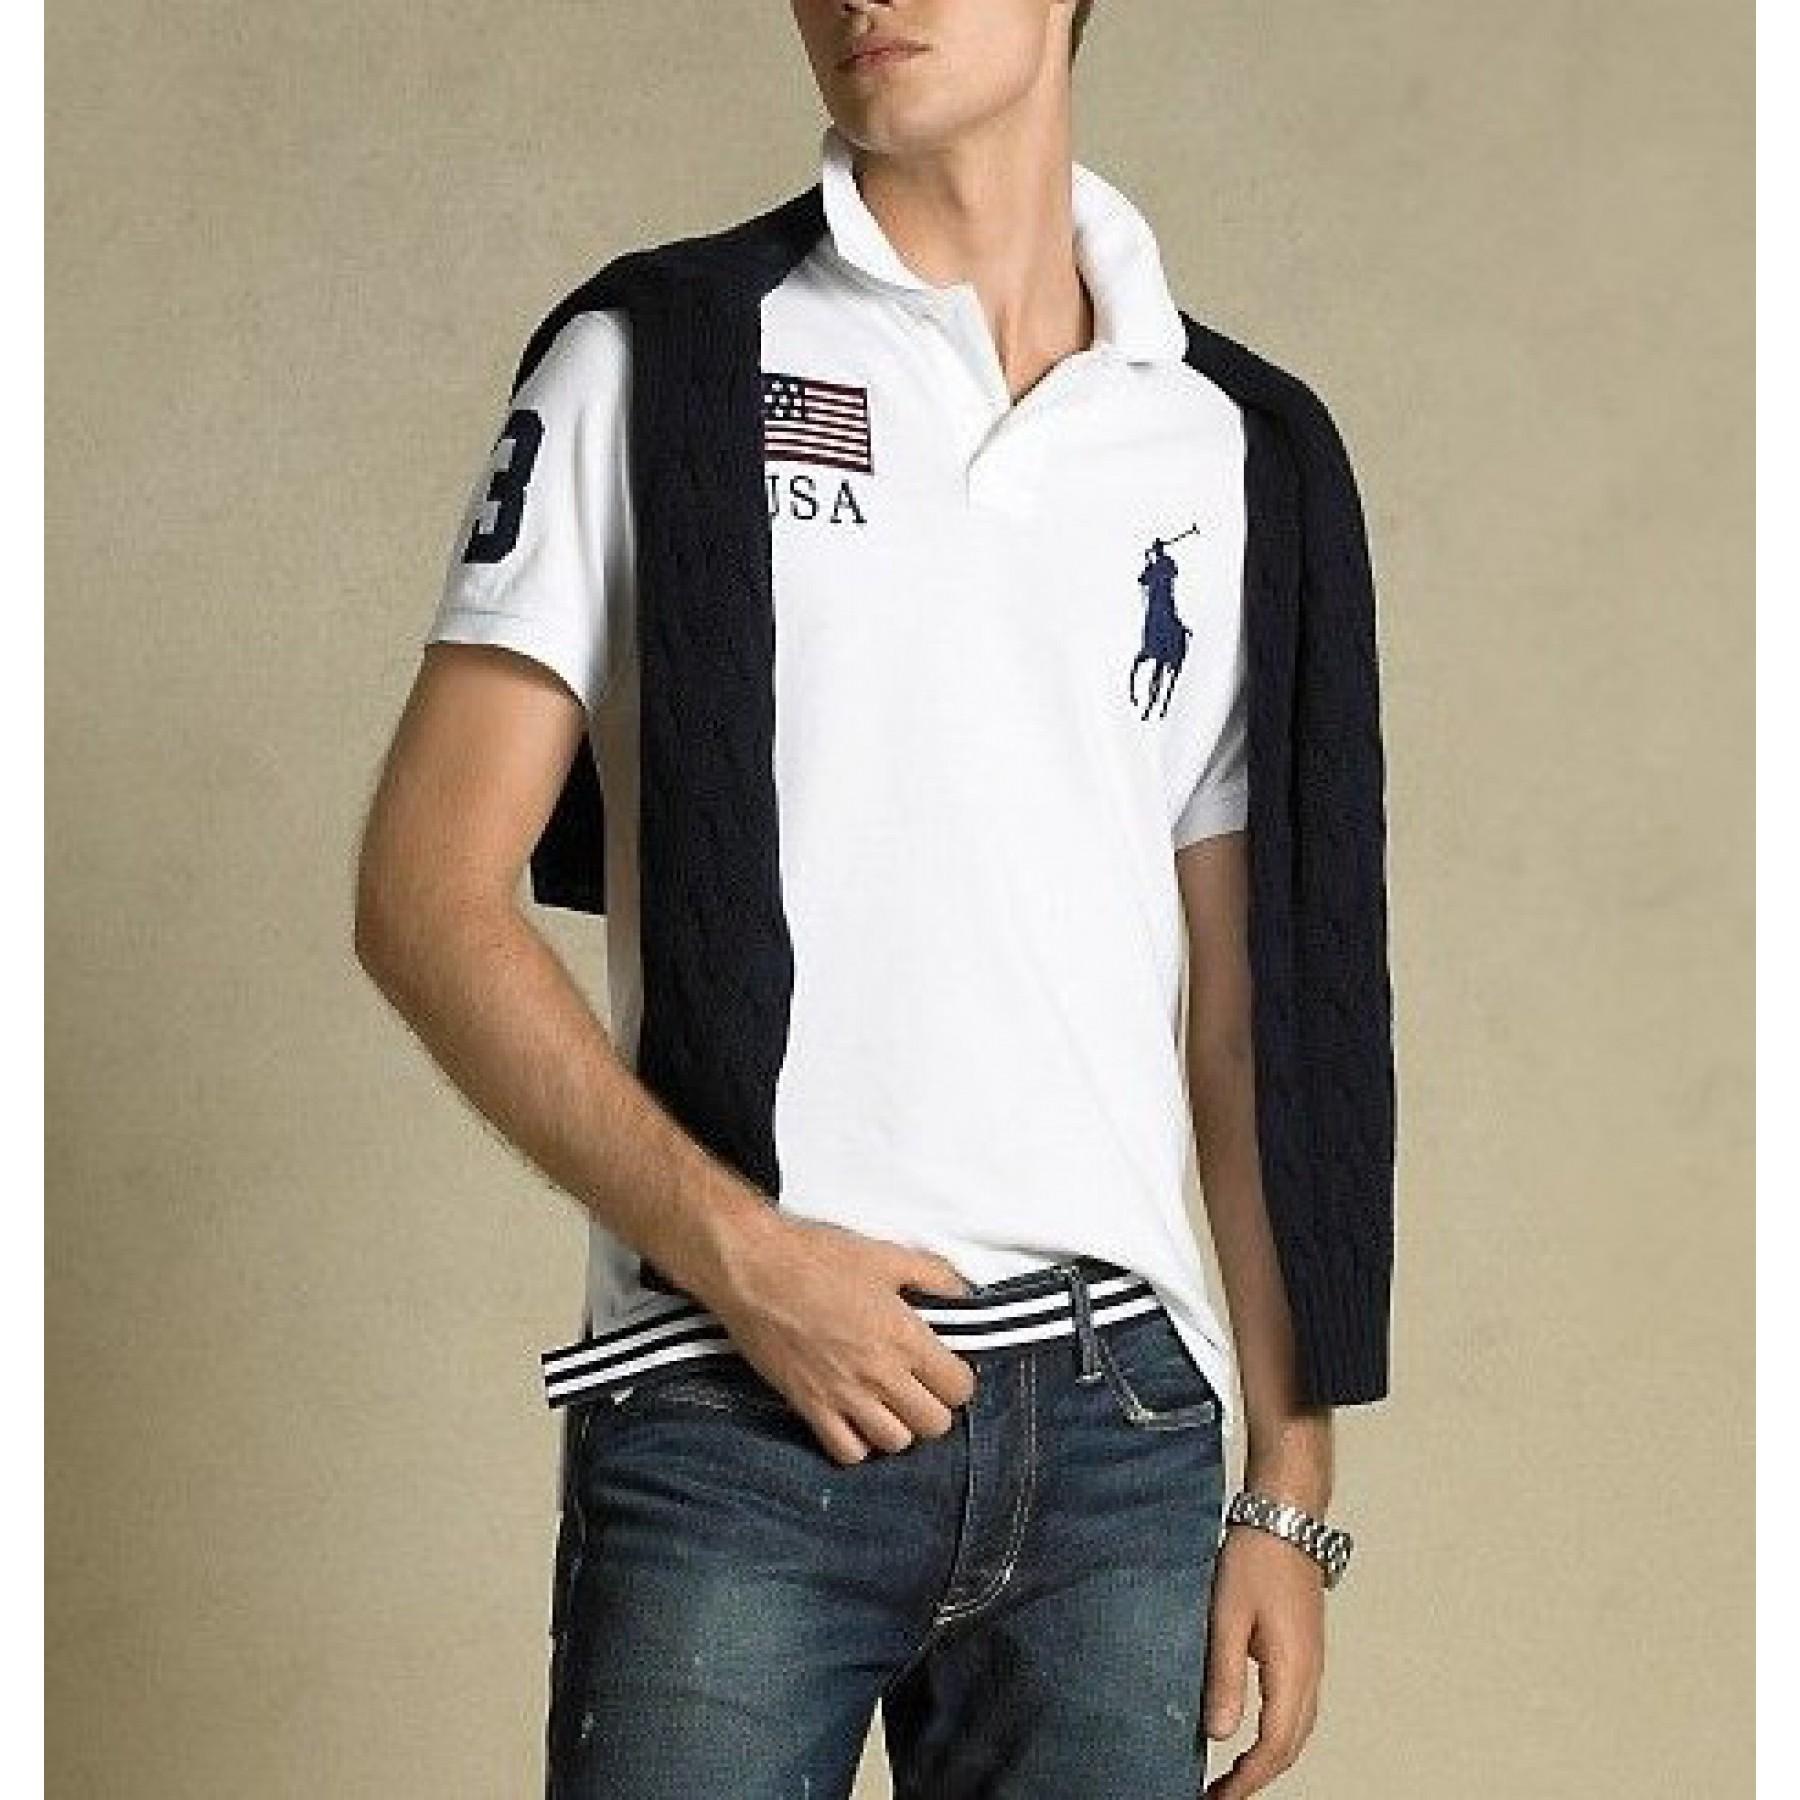 Camisa polo Ralph Lauren modelo Usa cor branca Cod 0606 5ac99aab4ec76